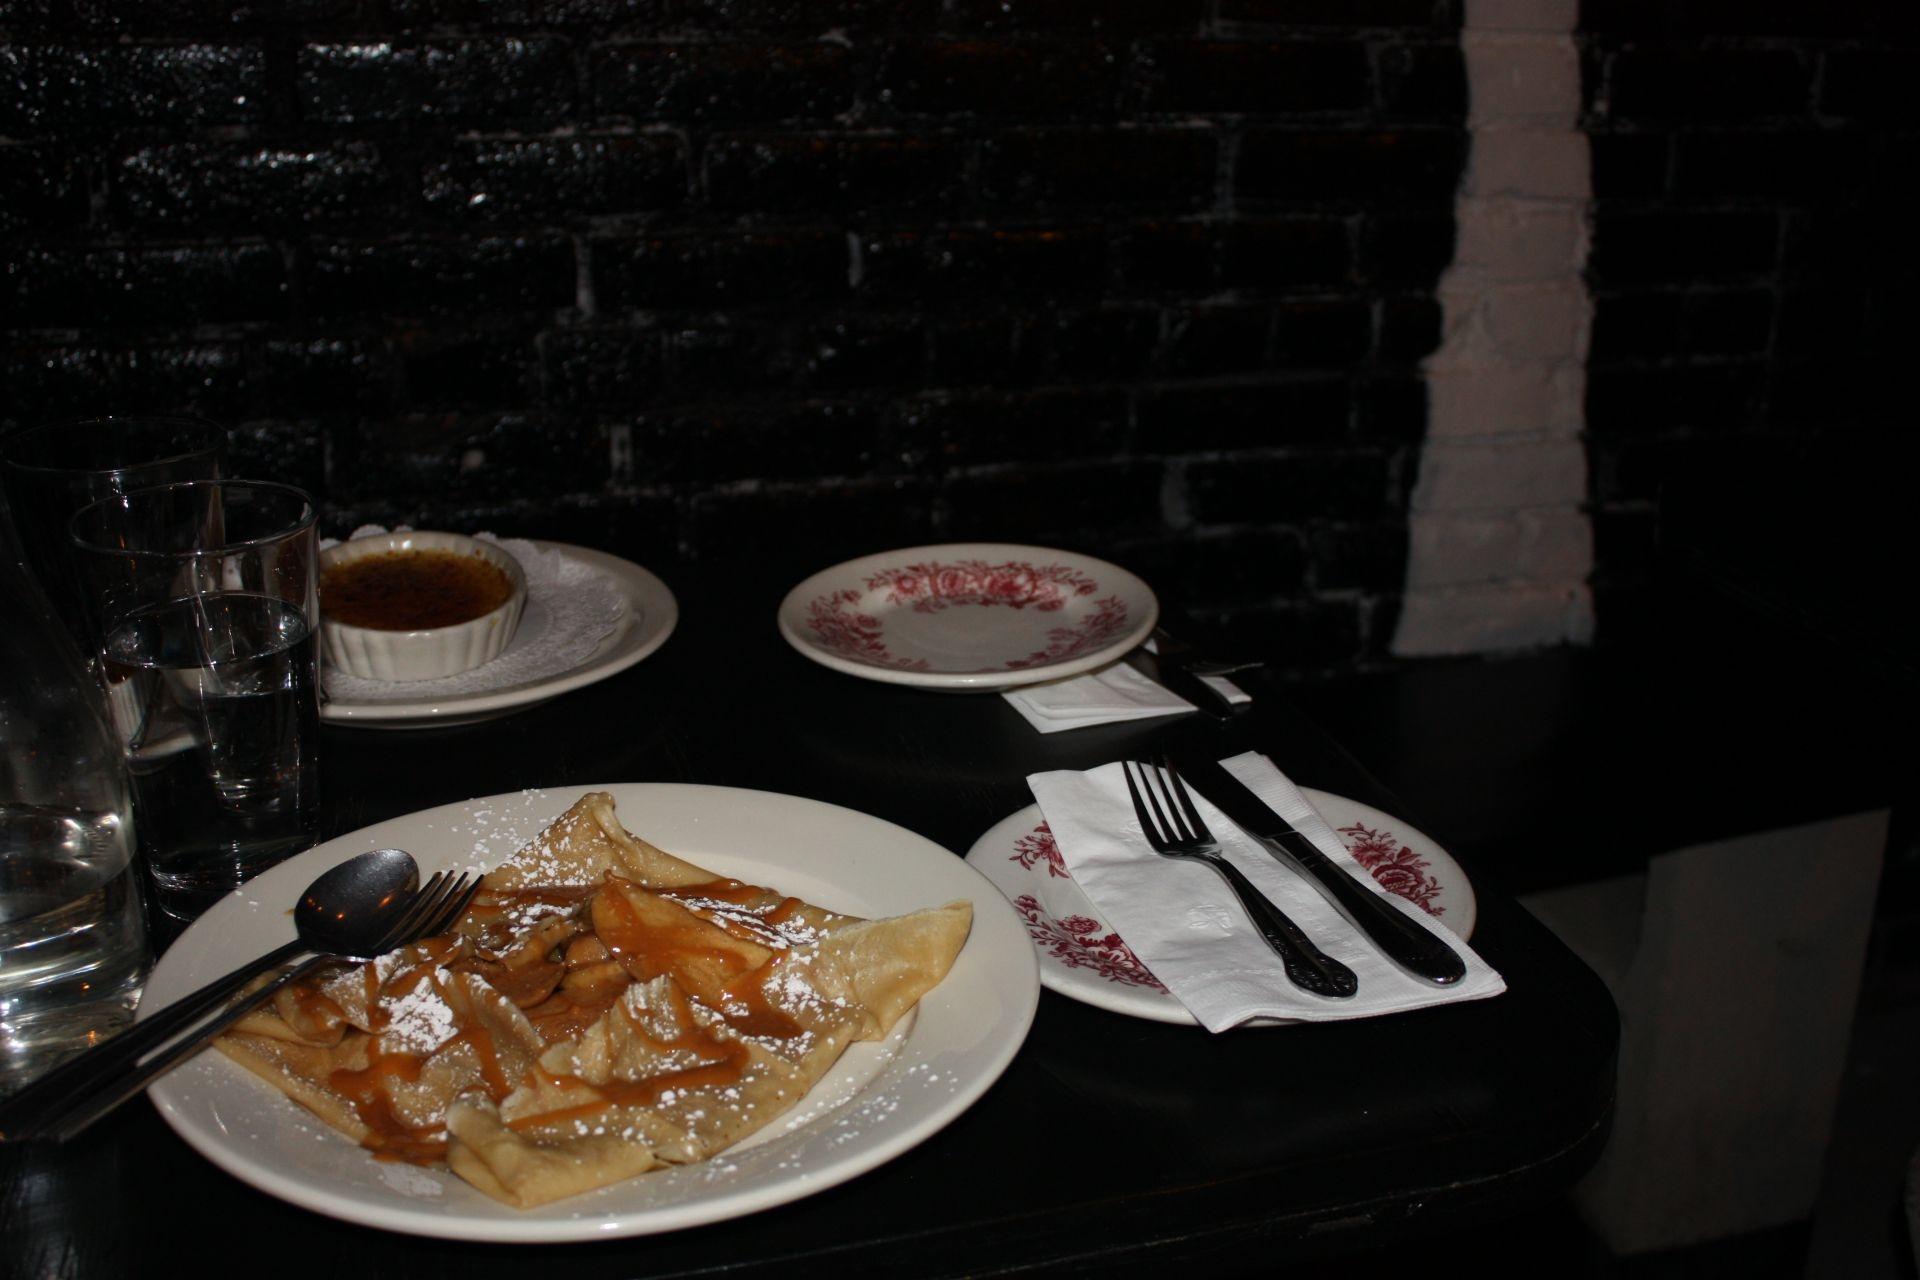 two delicious desserts